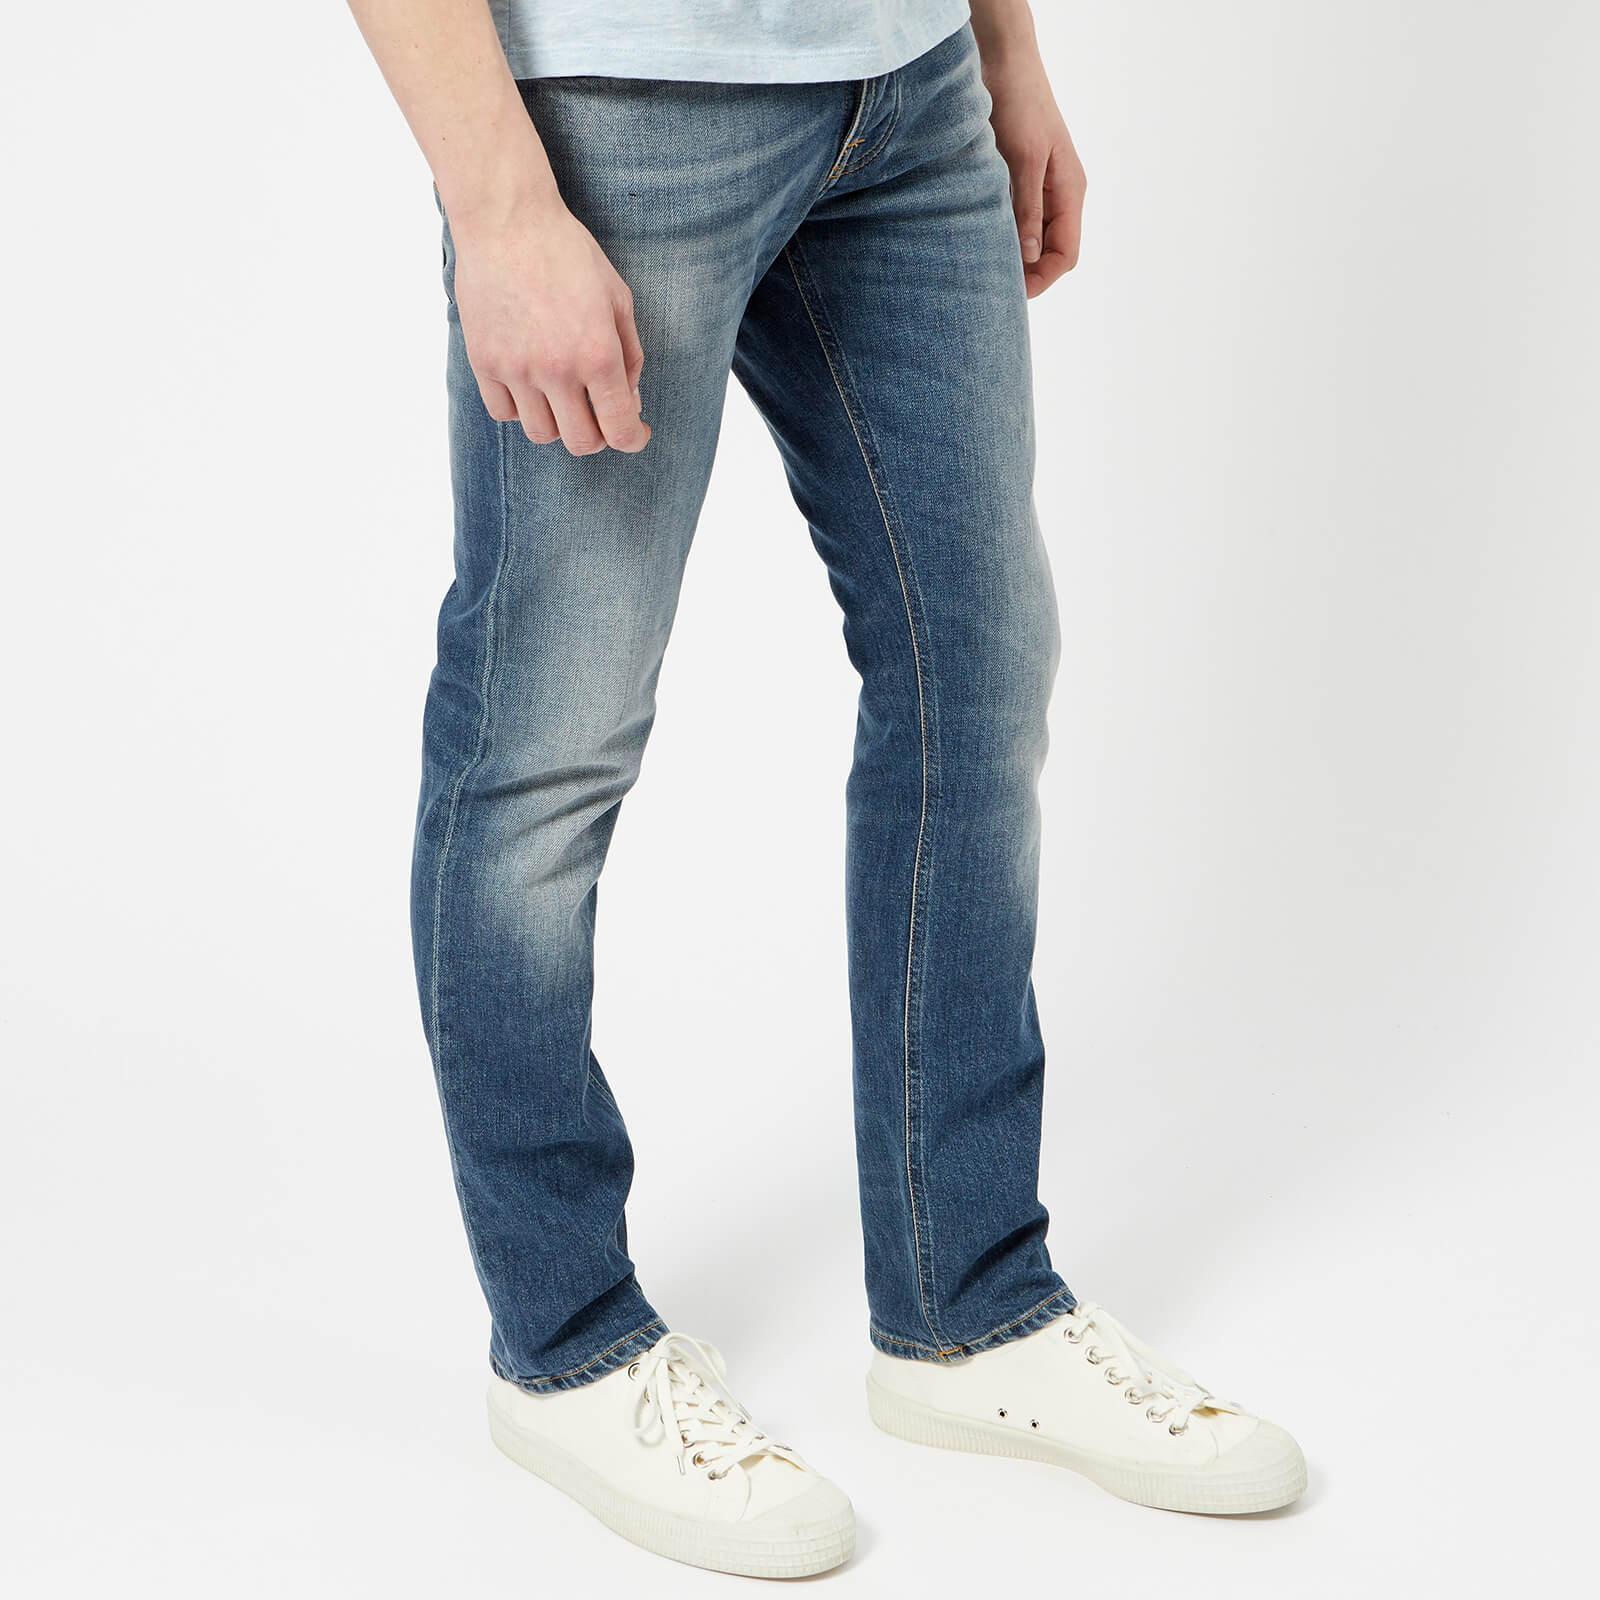 Nudie Jeans Denim Grim Tim Jeans in Blue for Men